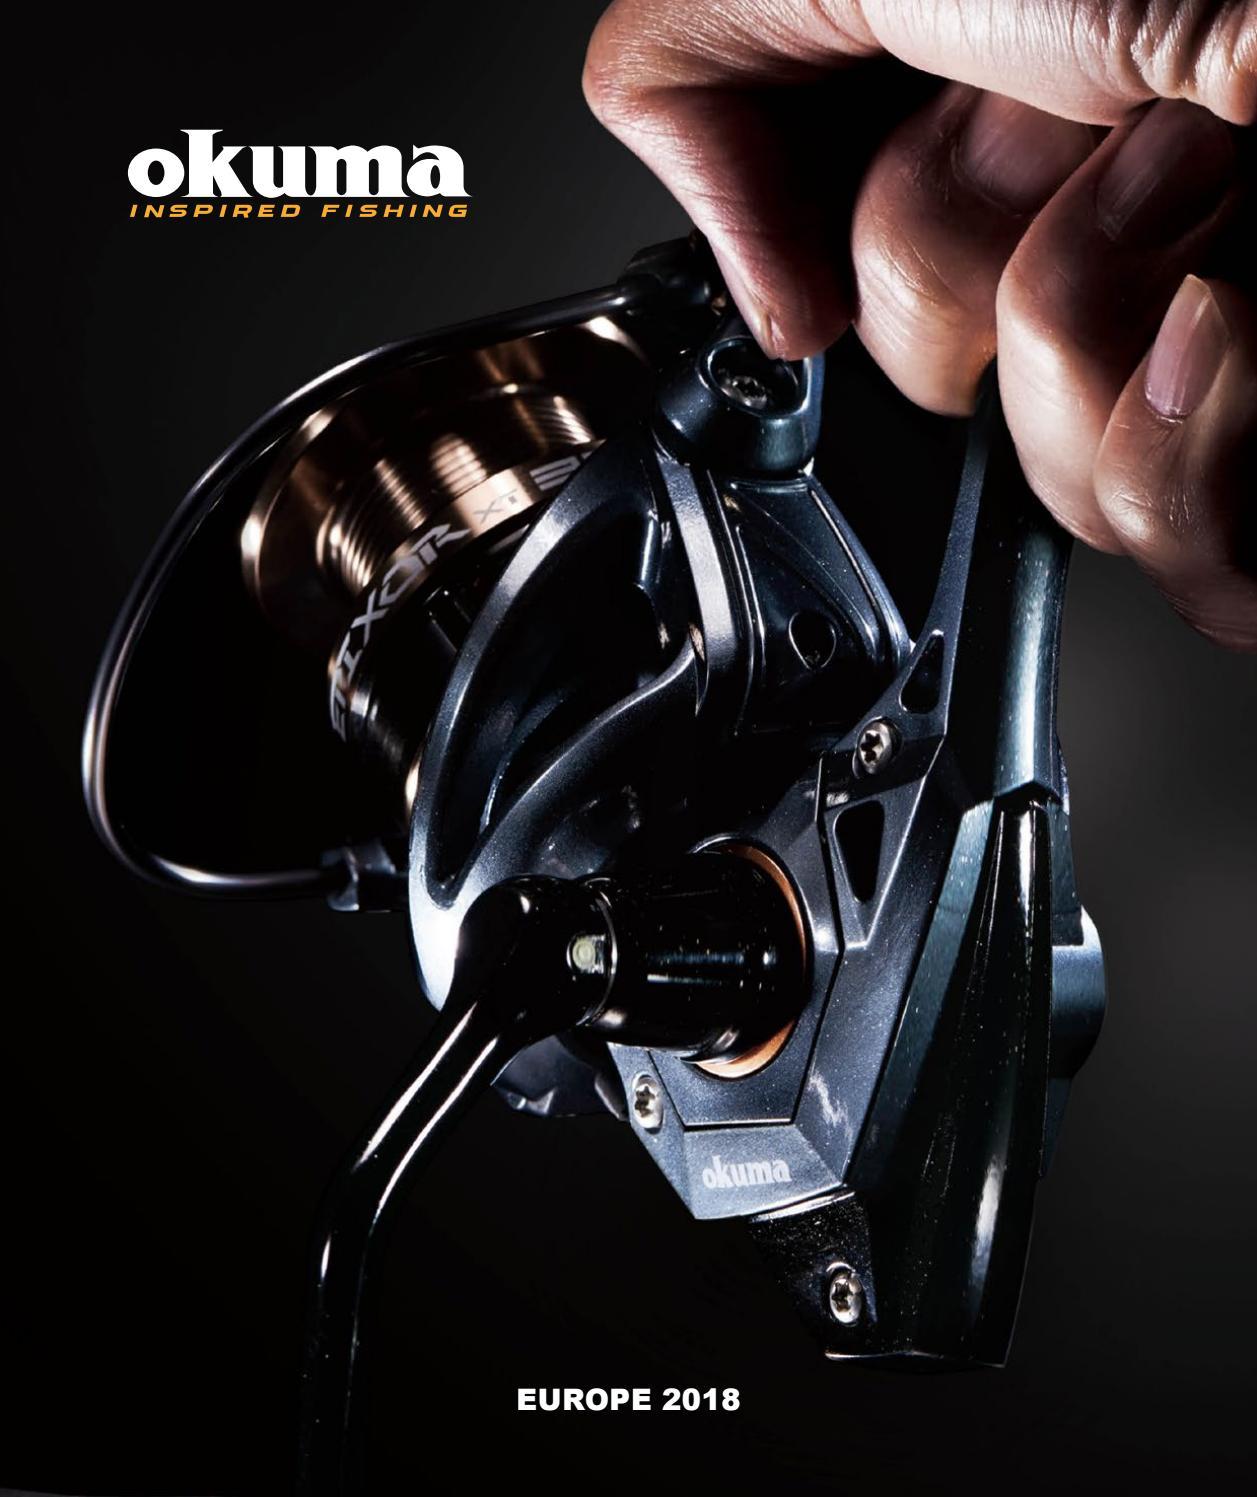 Okuma Proton ptn-30 Fixed Spool Reel Pre-spooled with Braid